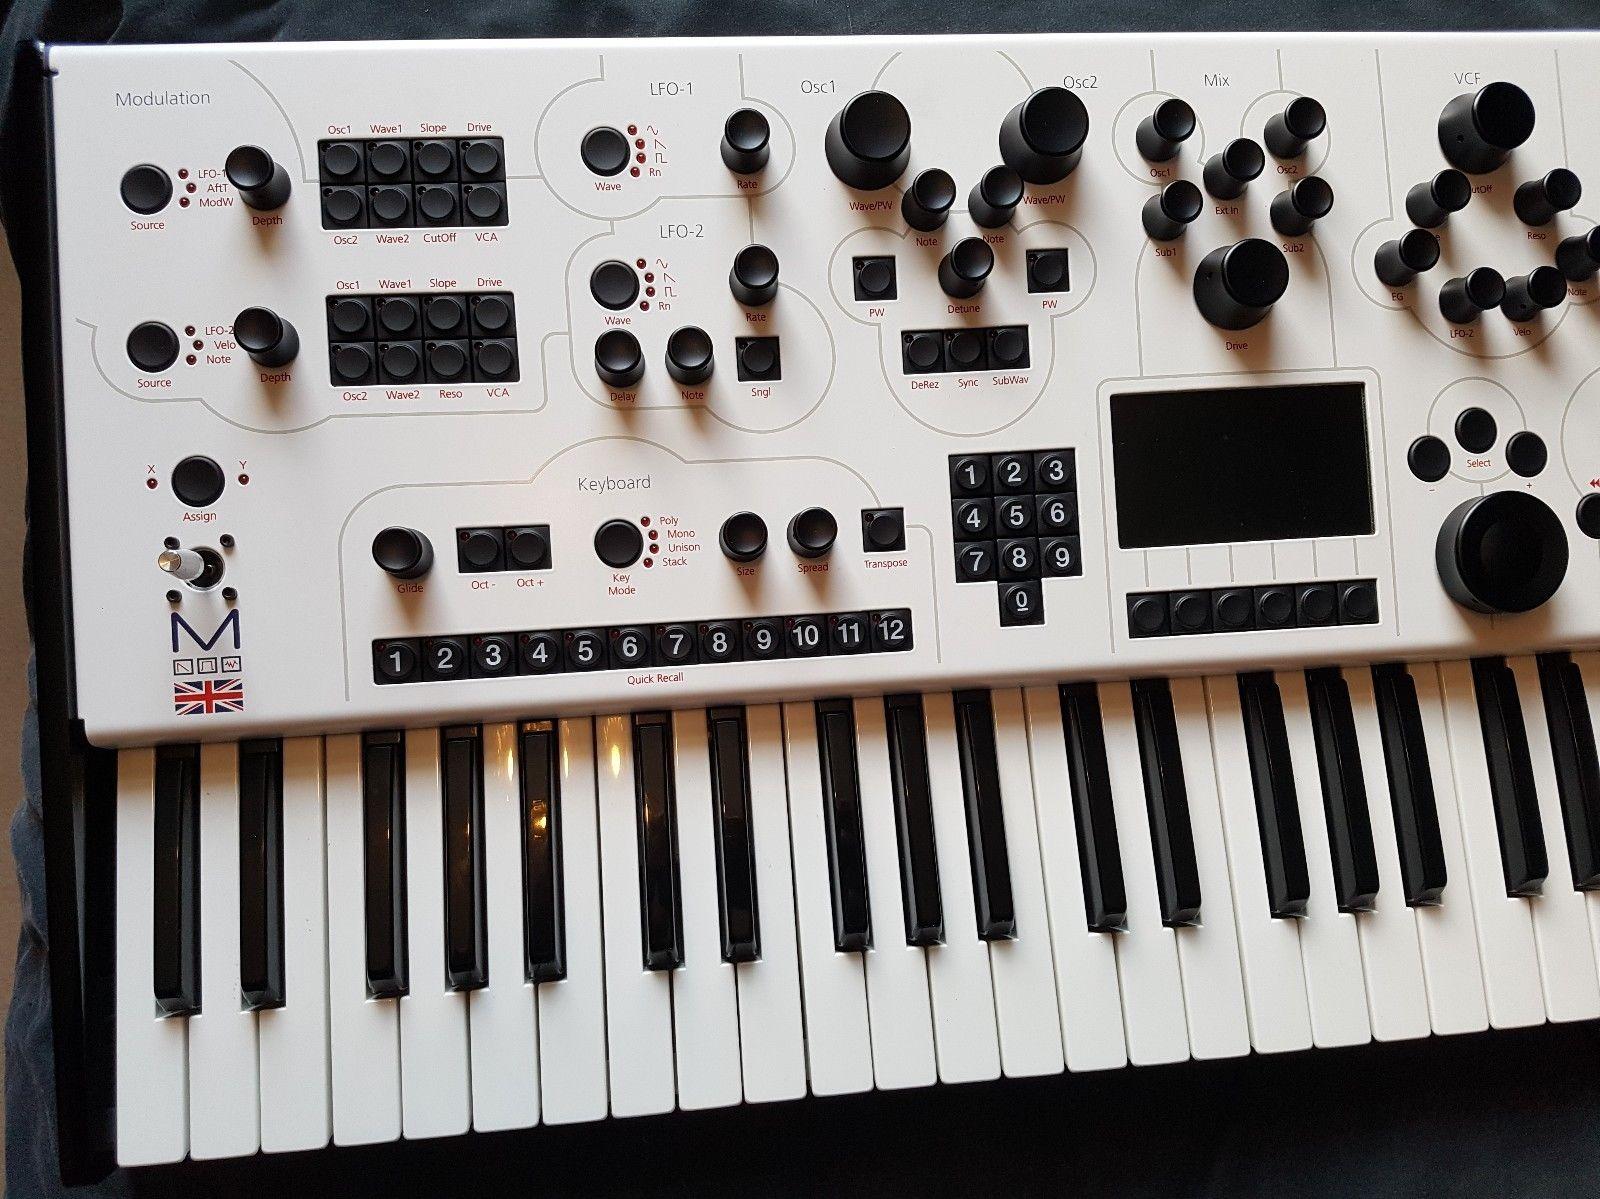 matrixsynth modal electronics 002 synthesizer w original box. Black Bedroom Furniture Sets. Home Design Ideas